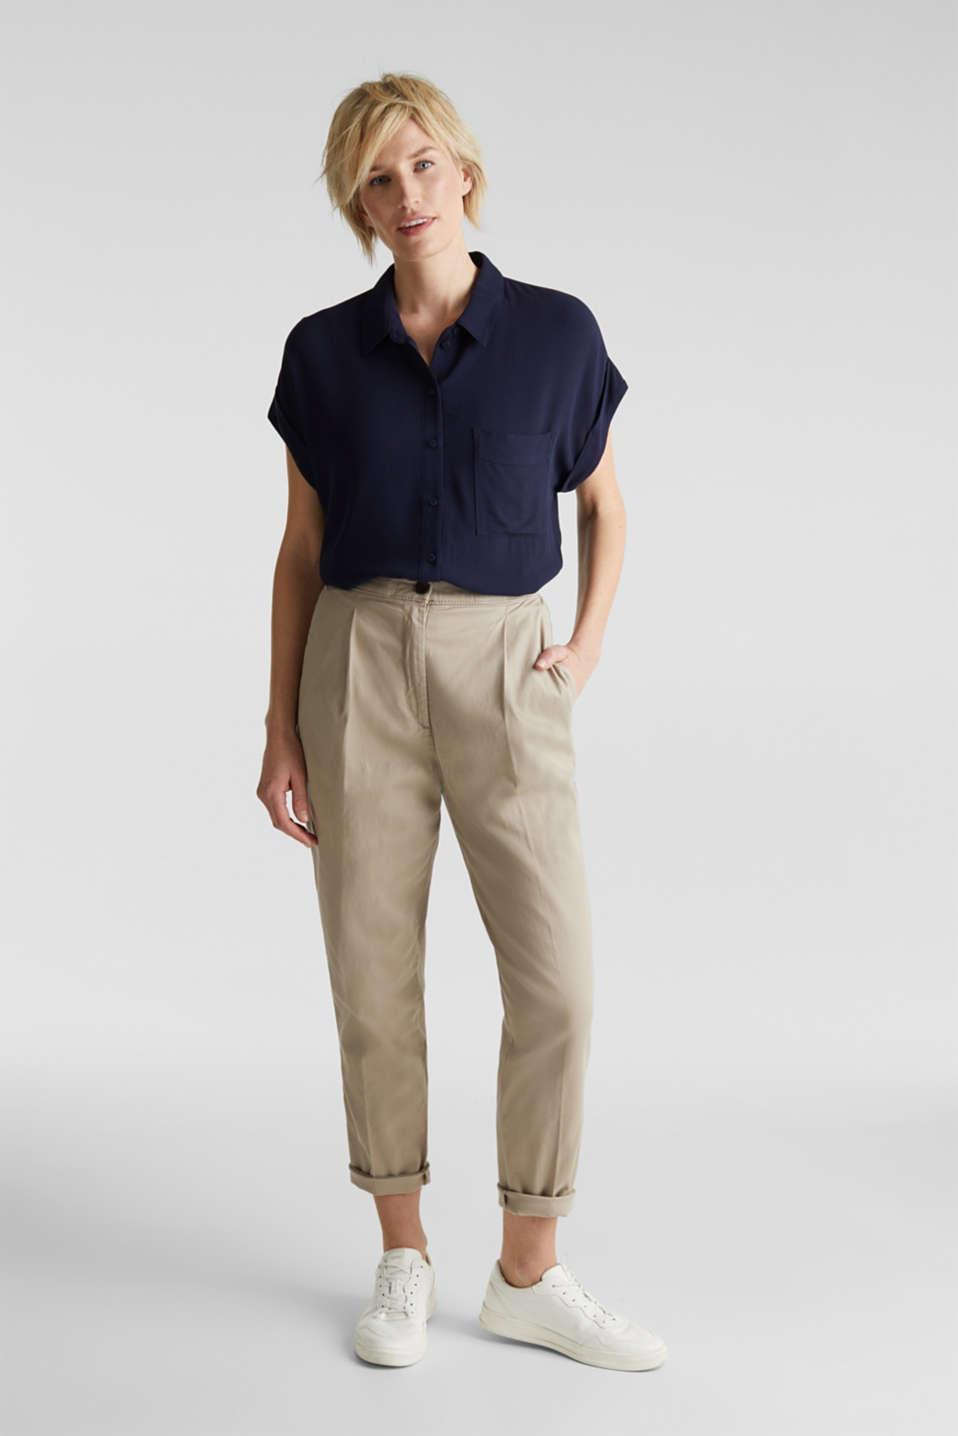 Crêpe blouse top, NAVY, detail image number 1